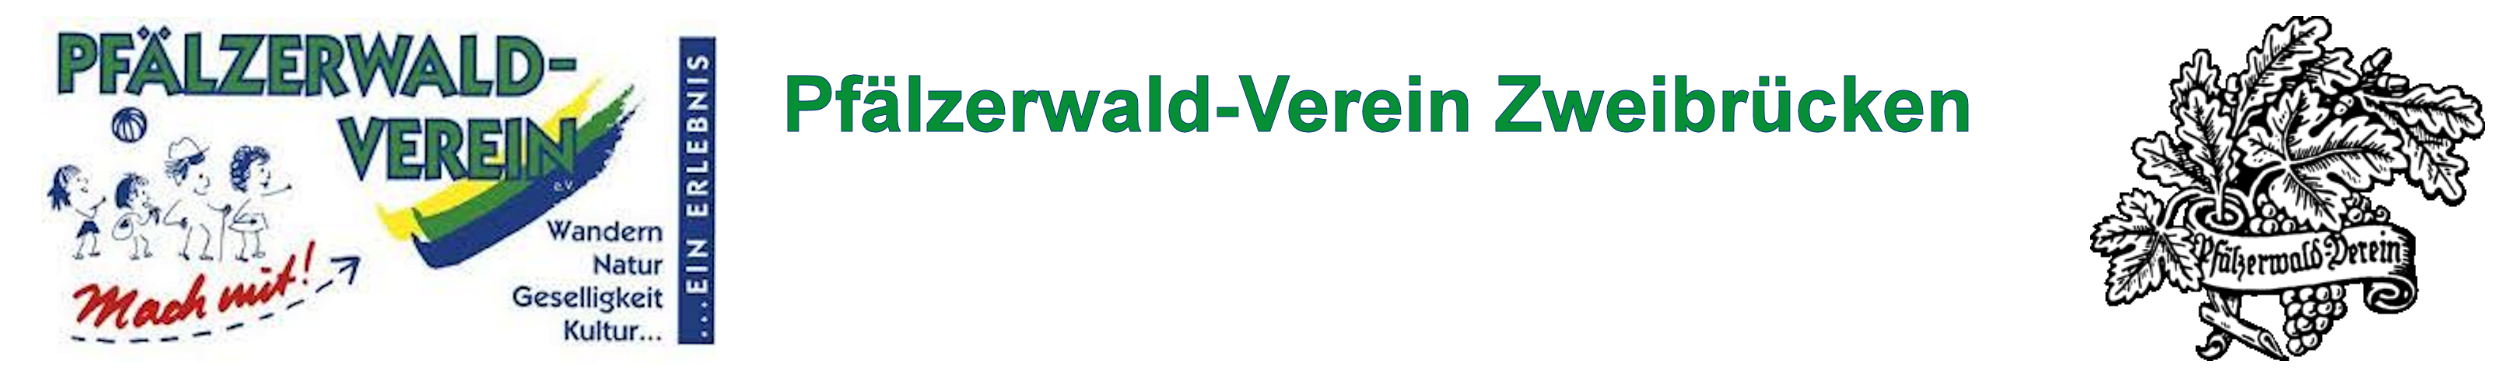 Pfälzerwald Verein OG Zweibrücken